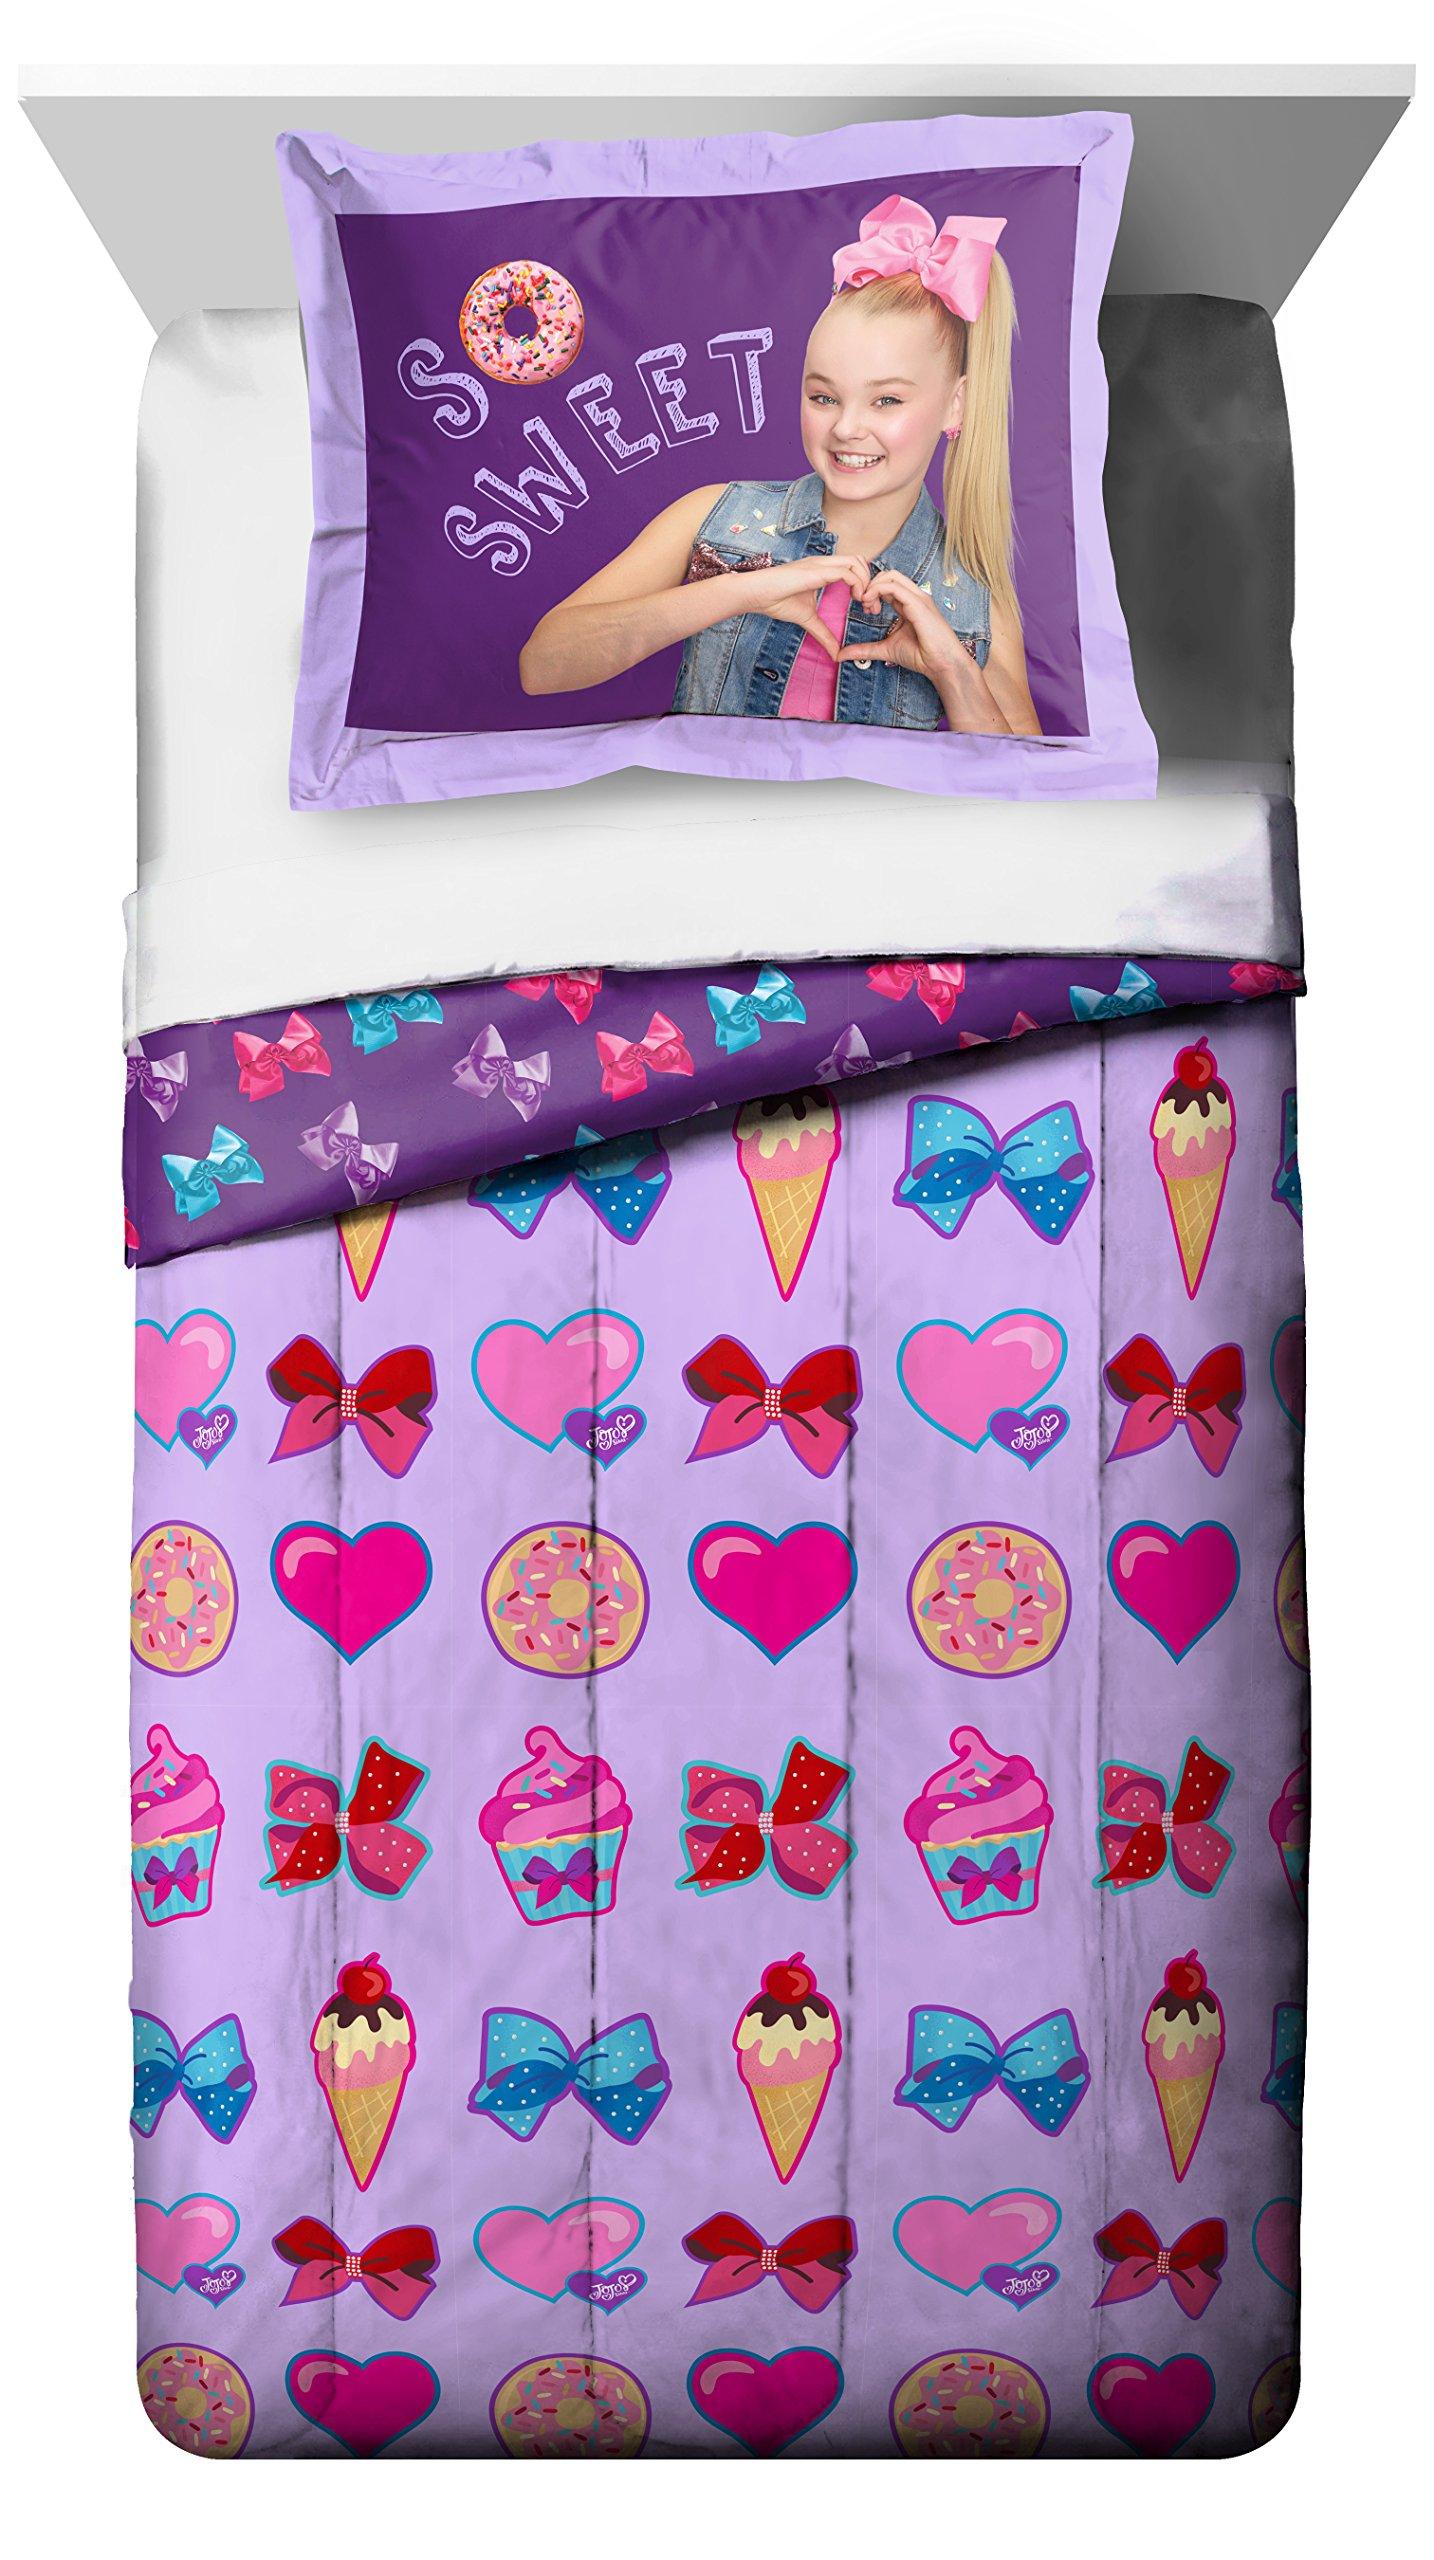 Jay Franco JoJo Siwa Sweet Life Twin/Full Comforter and Sham Set, 2 Piece by Jay Franco